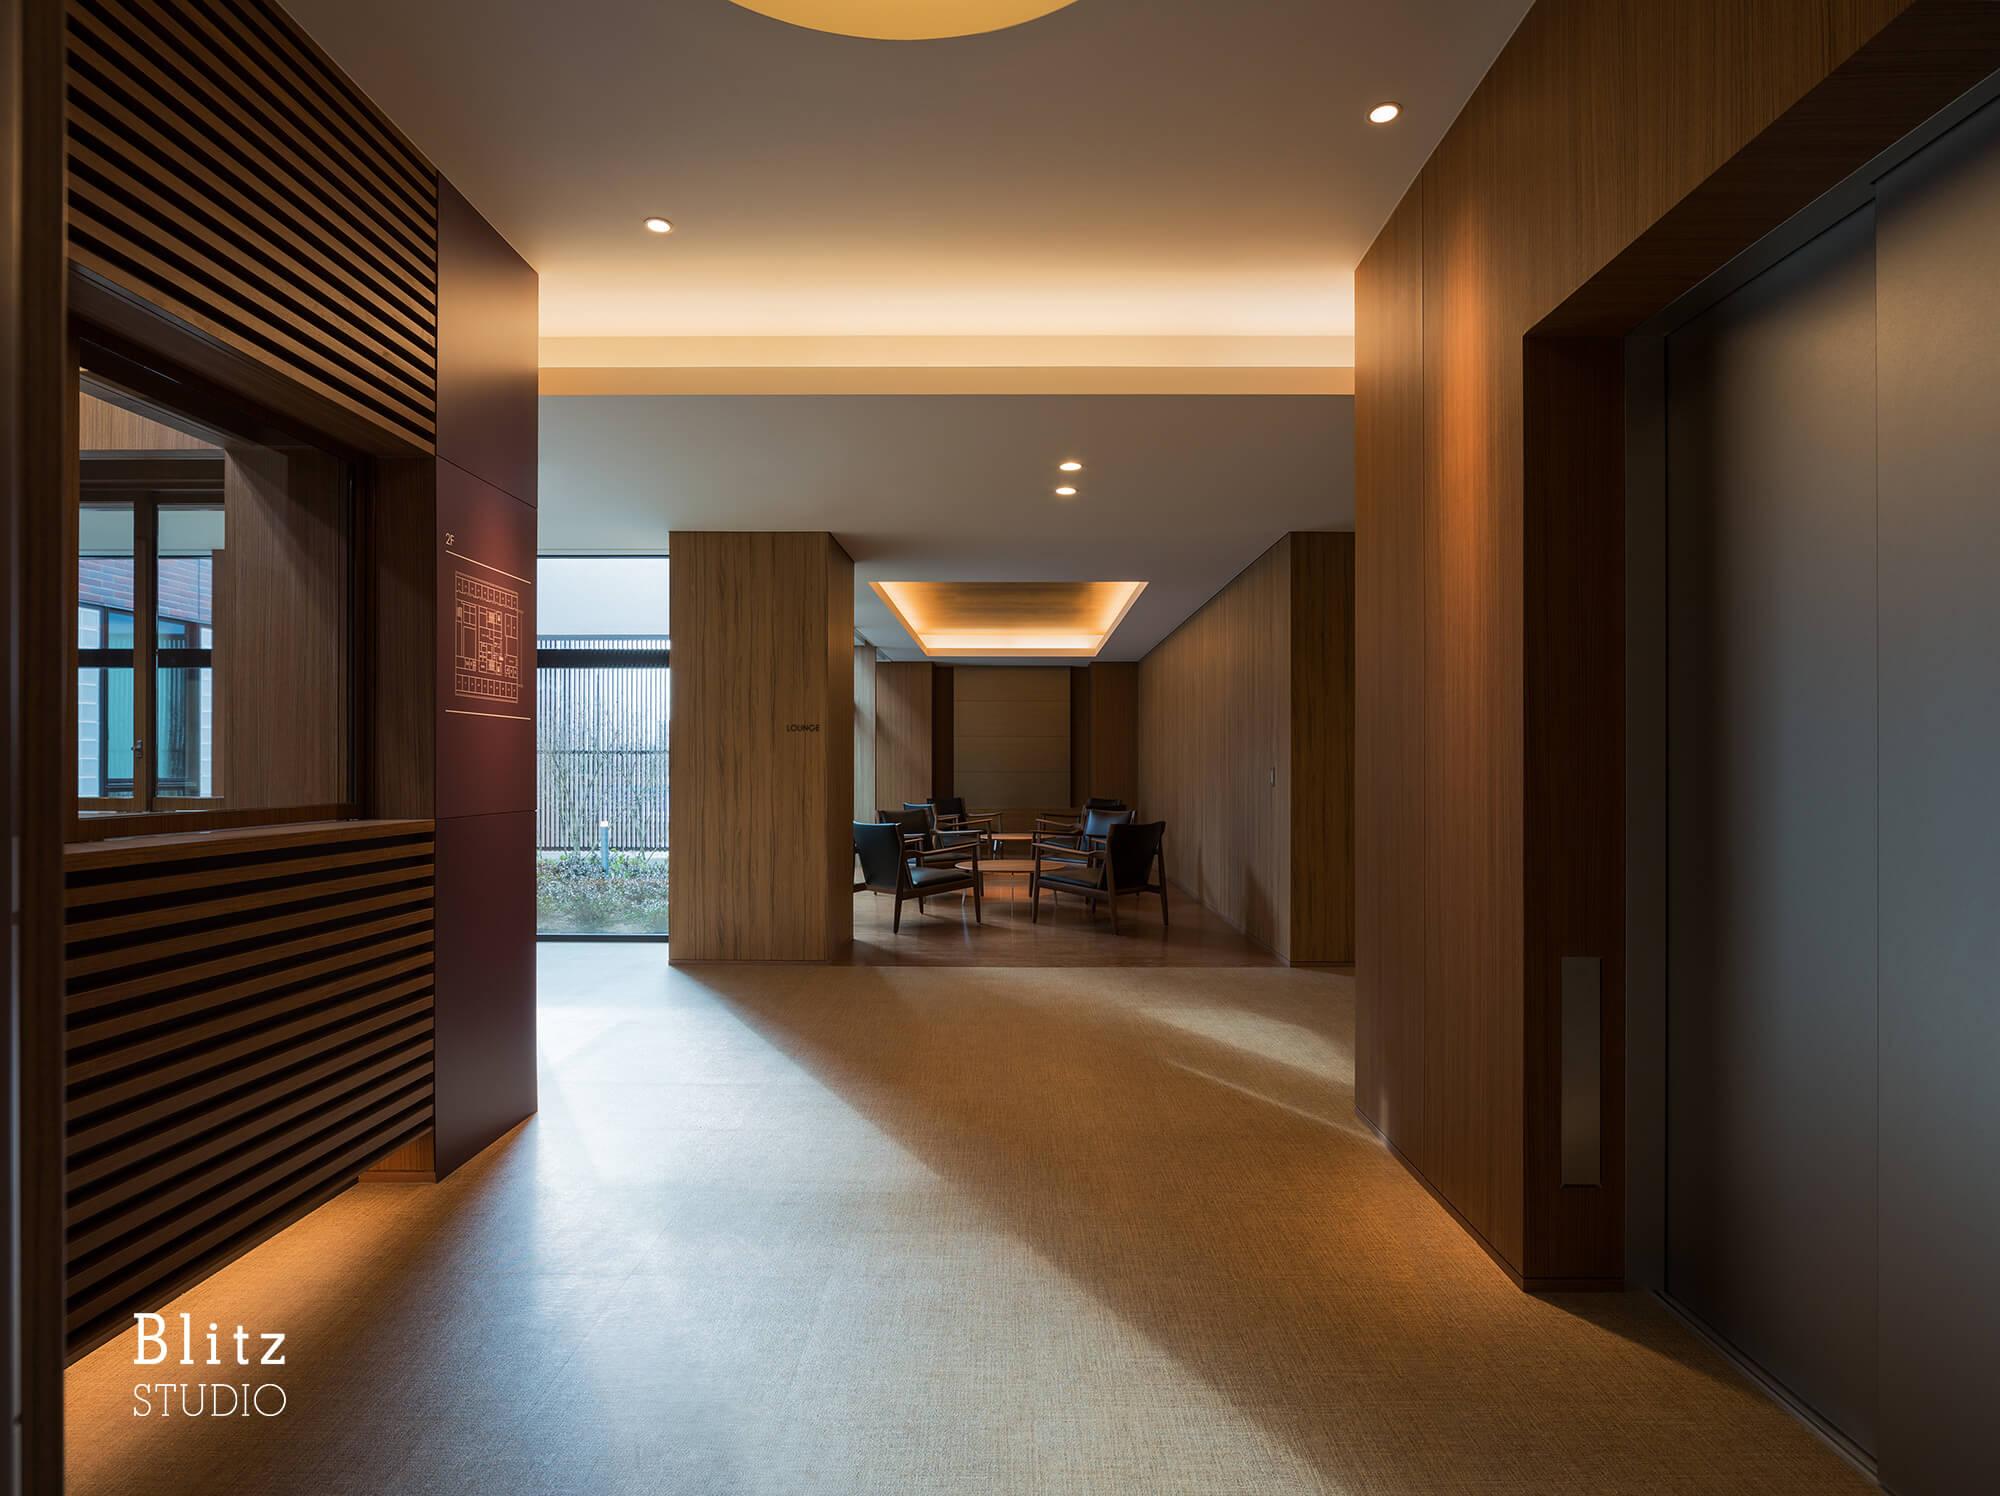 『桜ヶ丘病院』建築写真・竣工写真・インテリア写真9